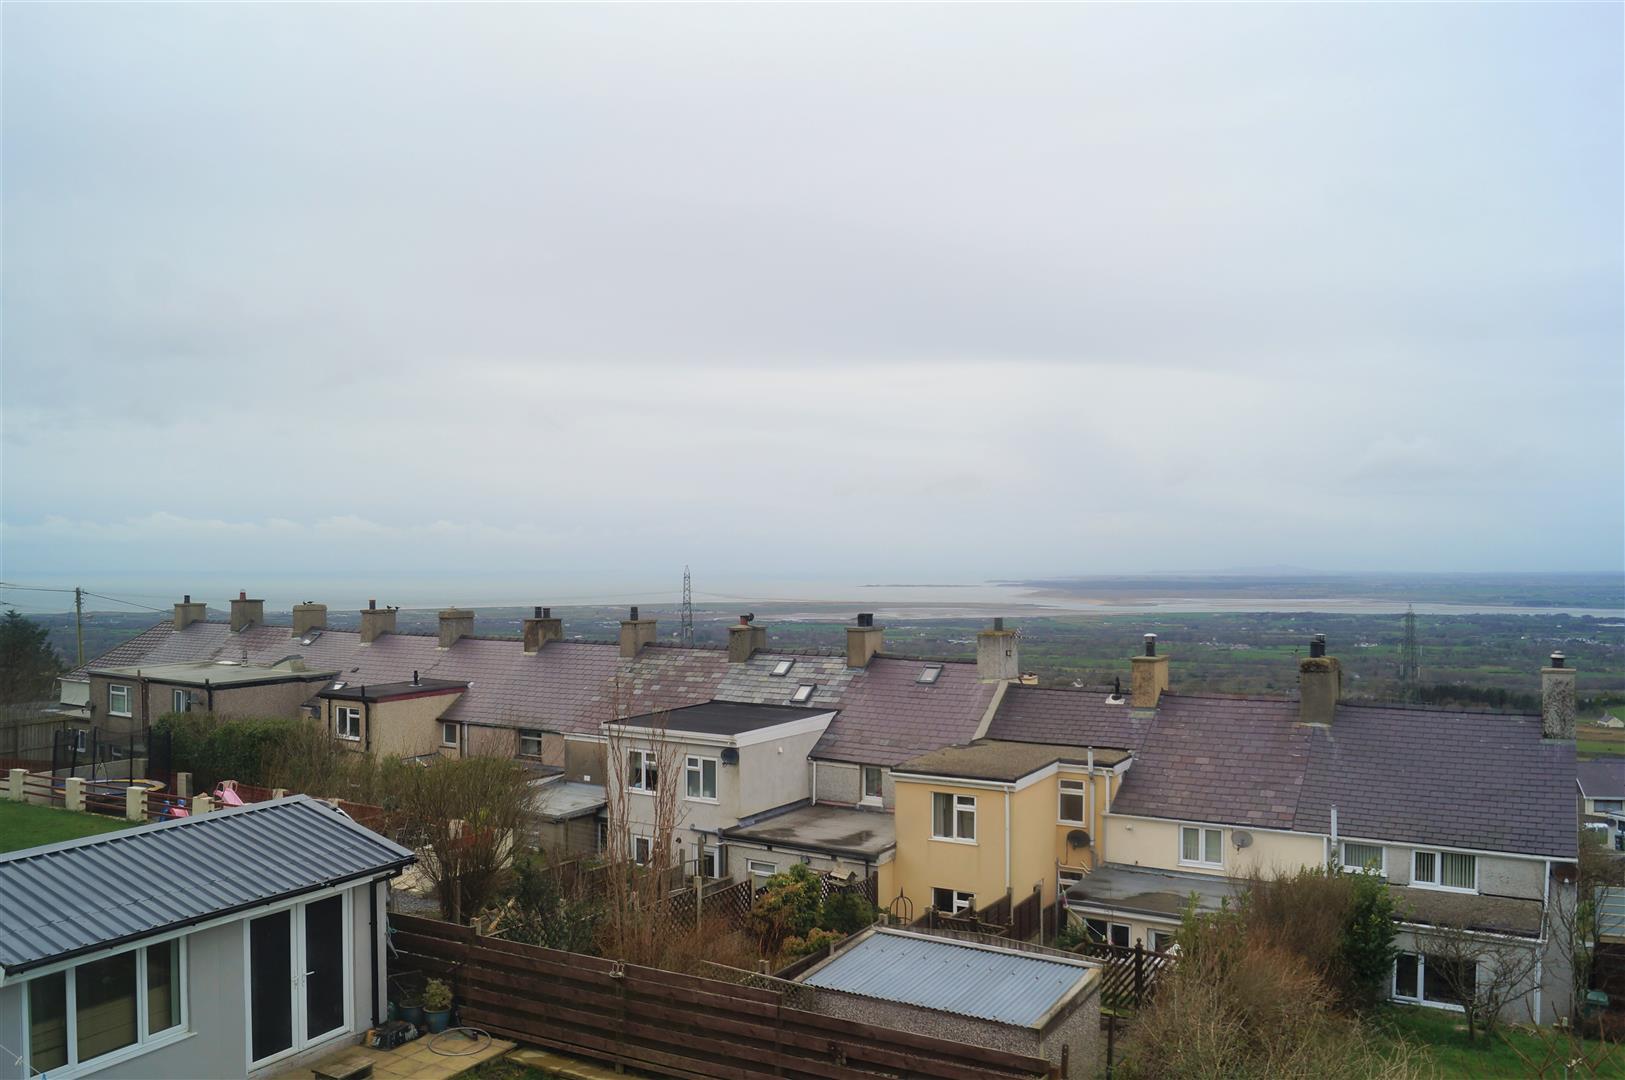 Rhosgadfan, Caernarfon